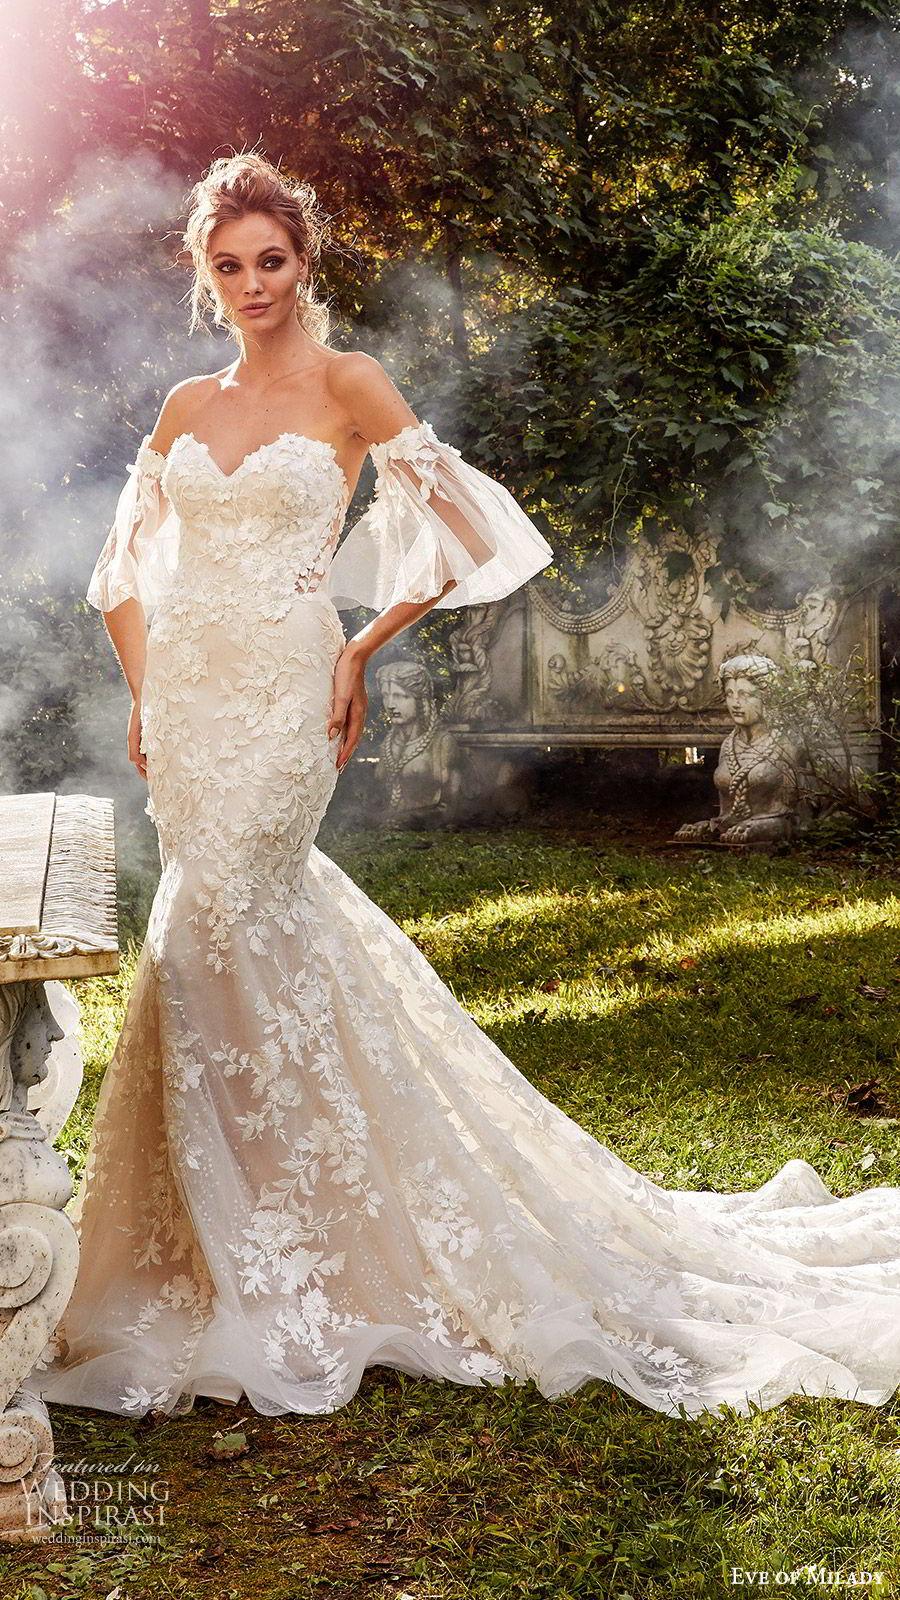 eve of milady fall 2018 bridal detached bell sleeves strapless sweetheart fully embellished mermaid wedding dress chapel train elegant romantic (1) mv